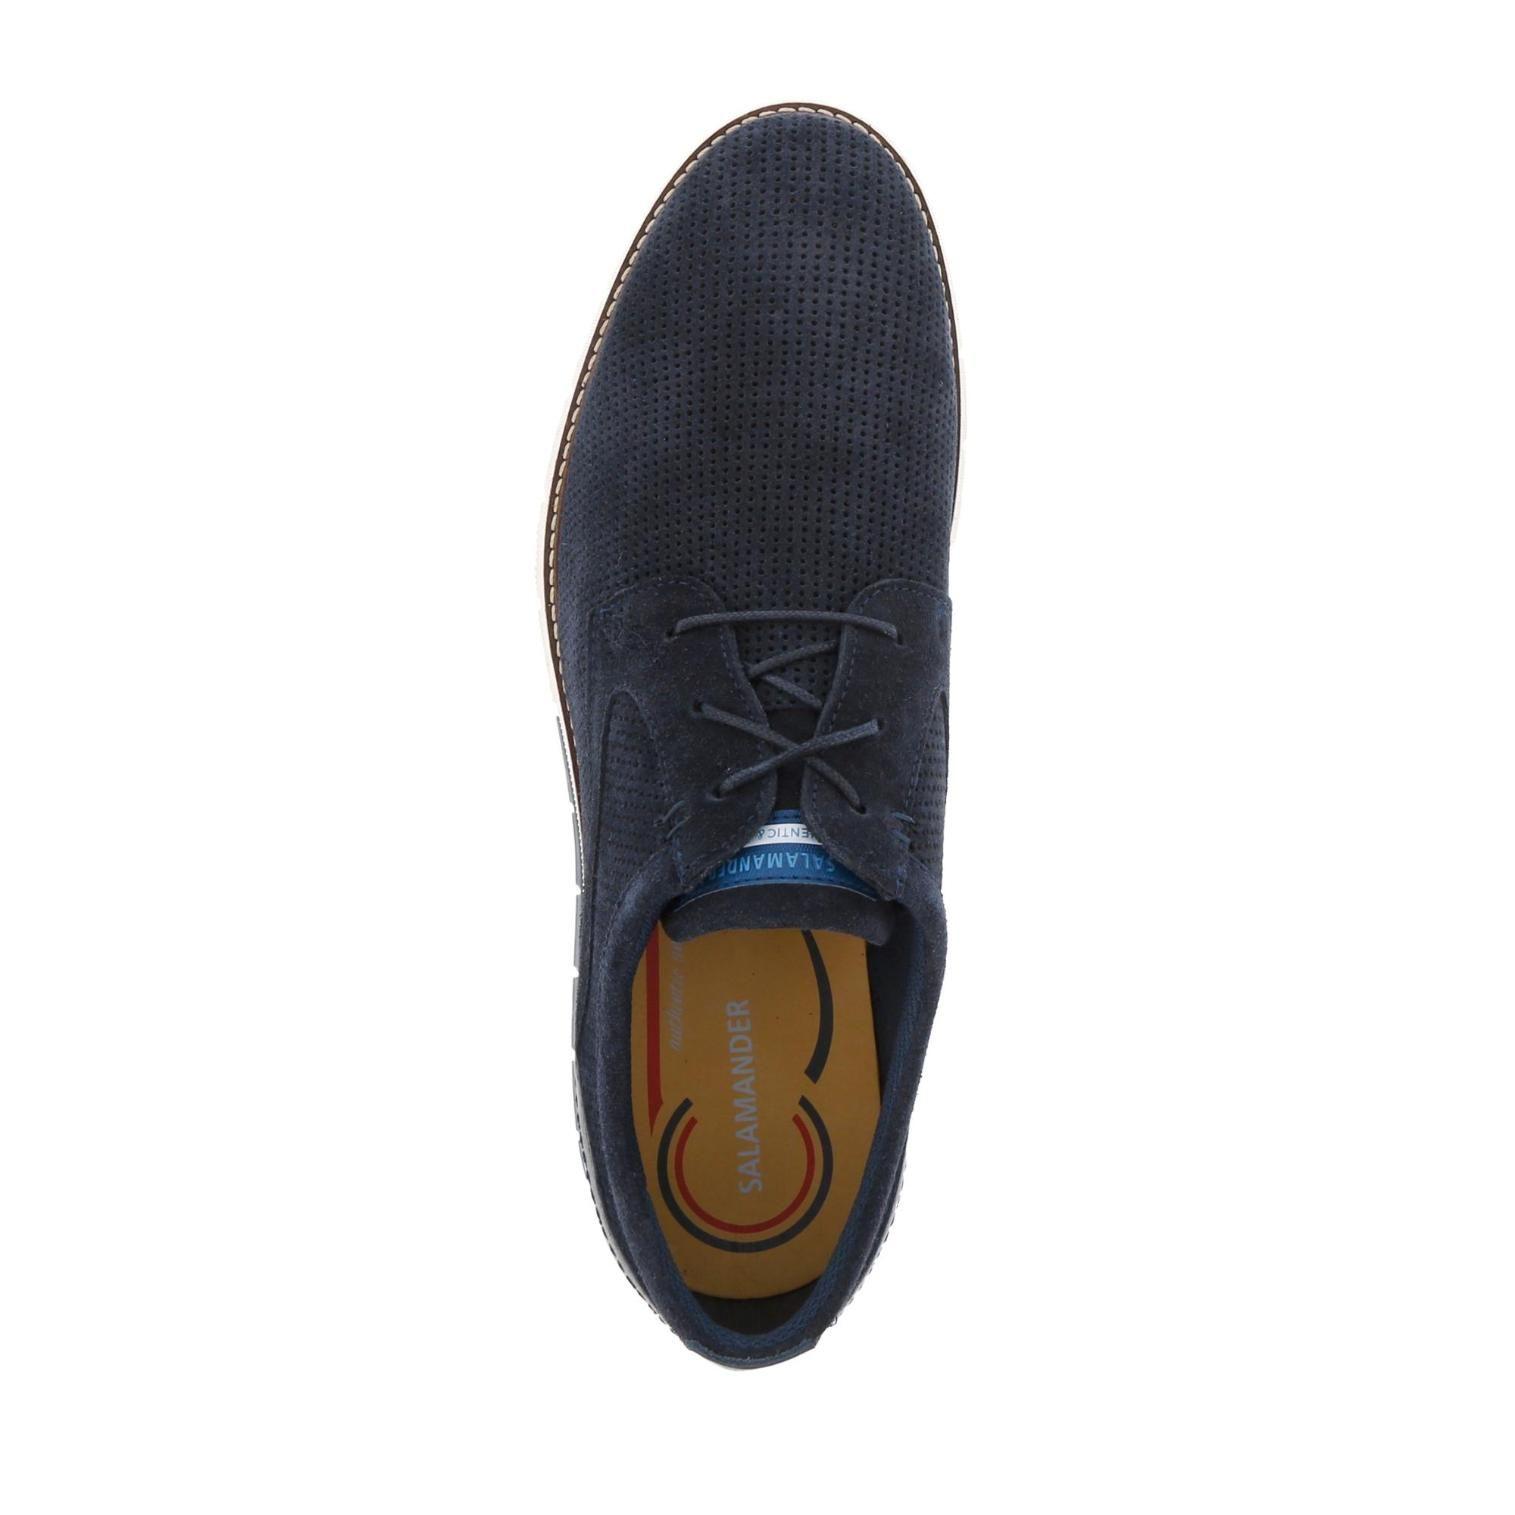 ea7340a0 Salamander Schnürschuh in Farbe marine um 29% reduziert online kaufen Calzado  Hombre, Calzas,